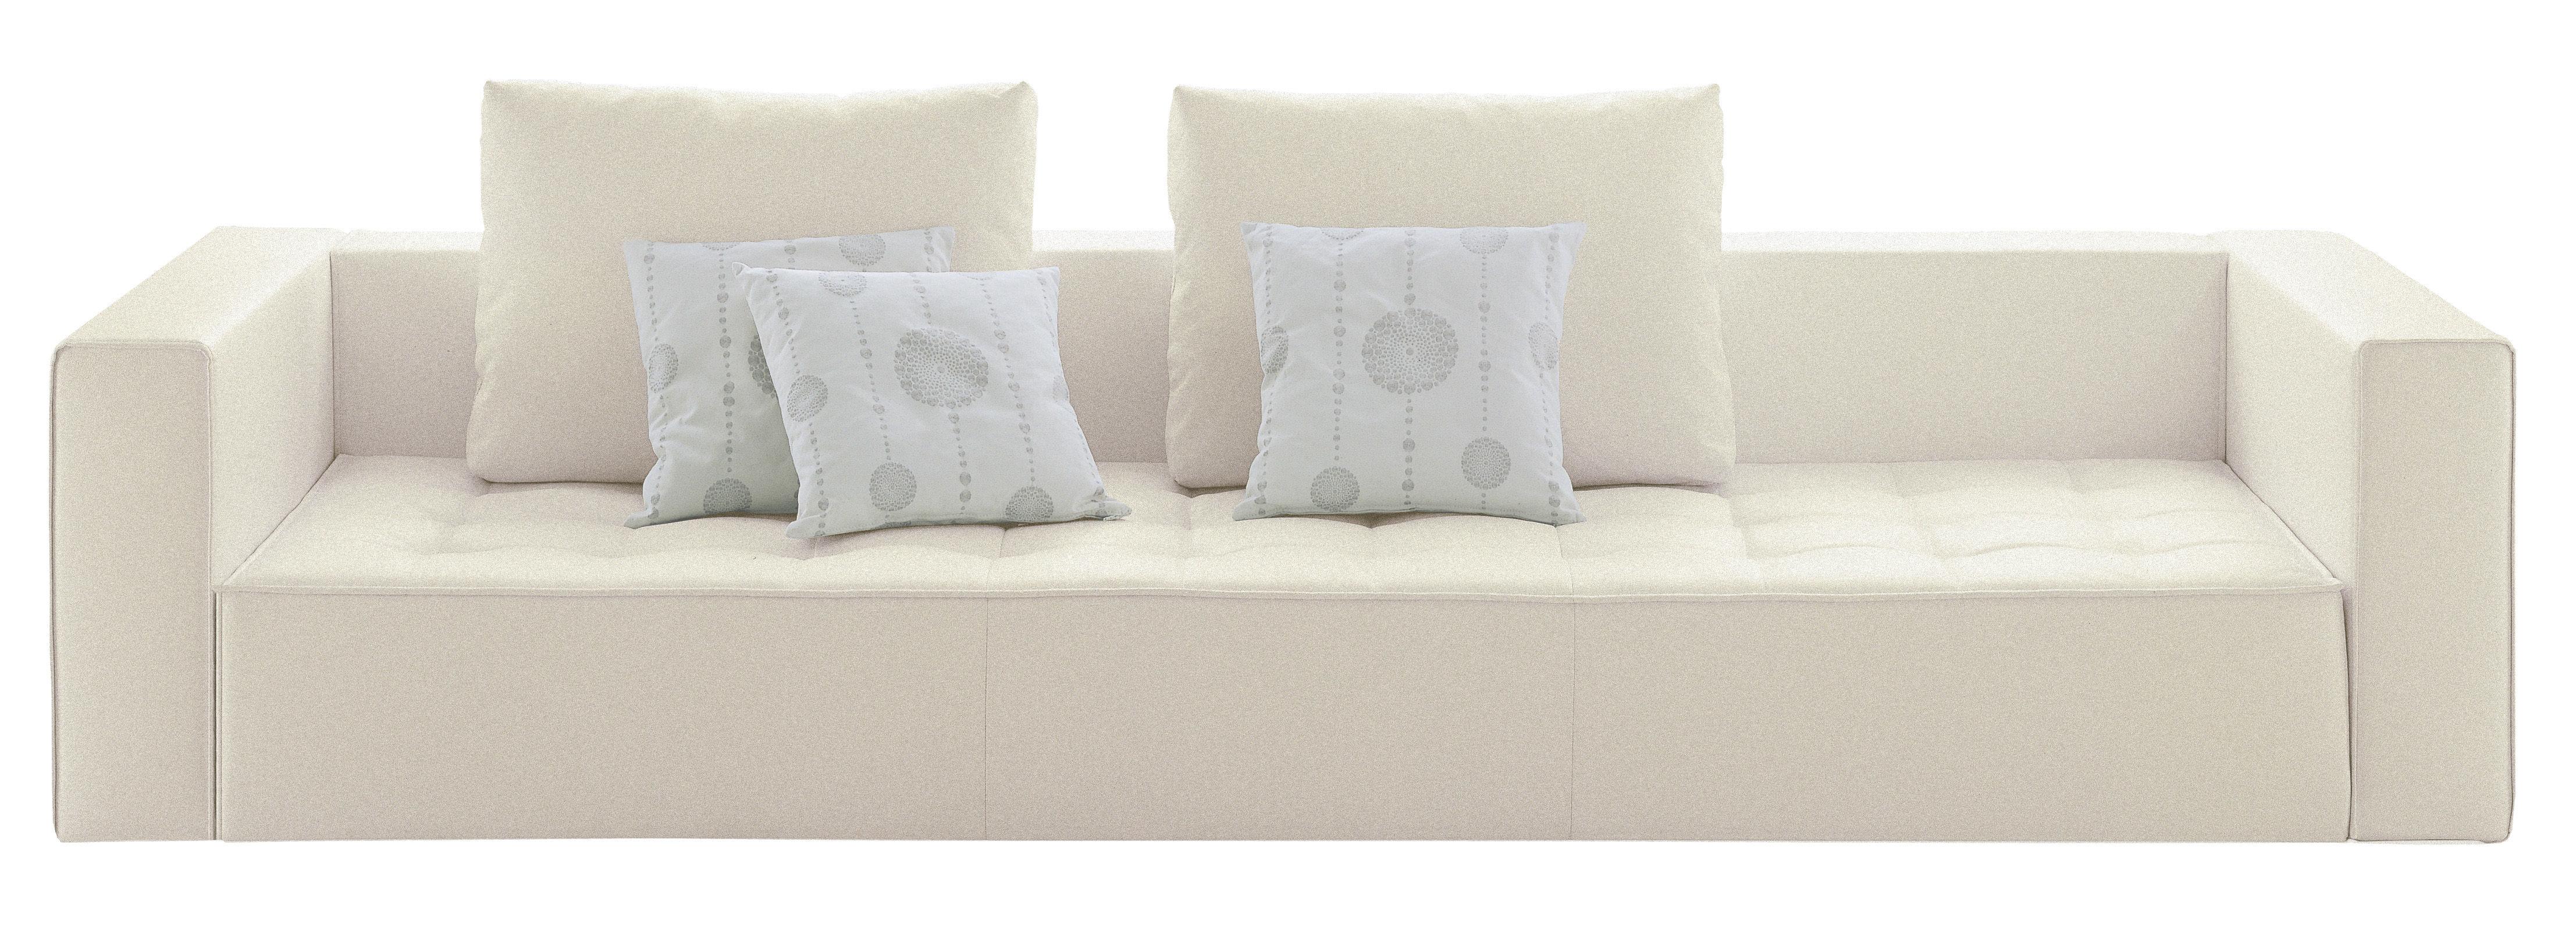 Möbel - Sofas - Kilt Sofa Stoff - 3-Sitzer - Zanotta - Stoff - creme - Gewebe